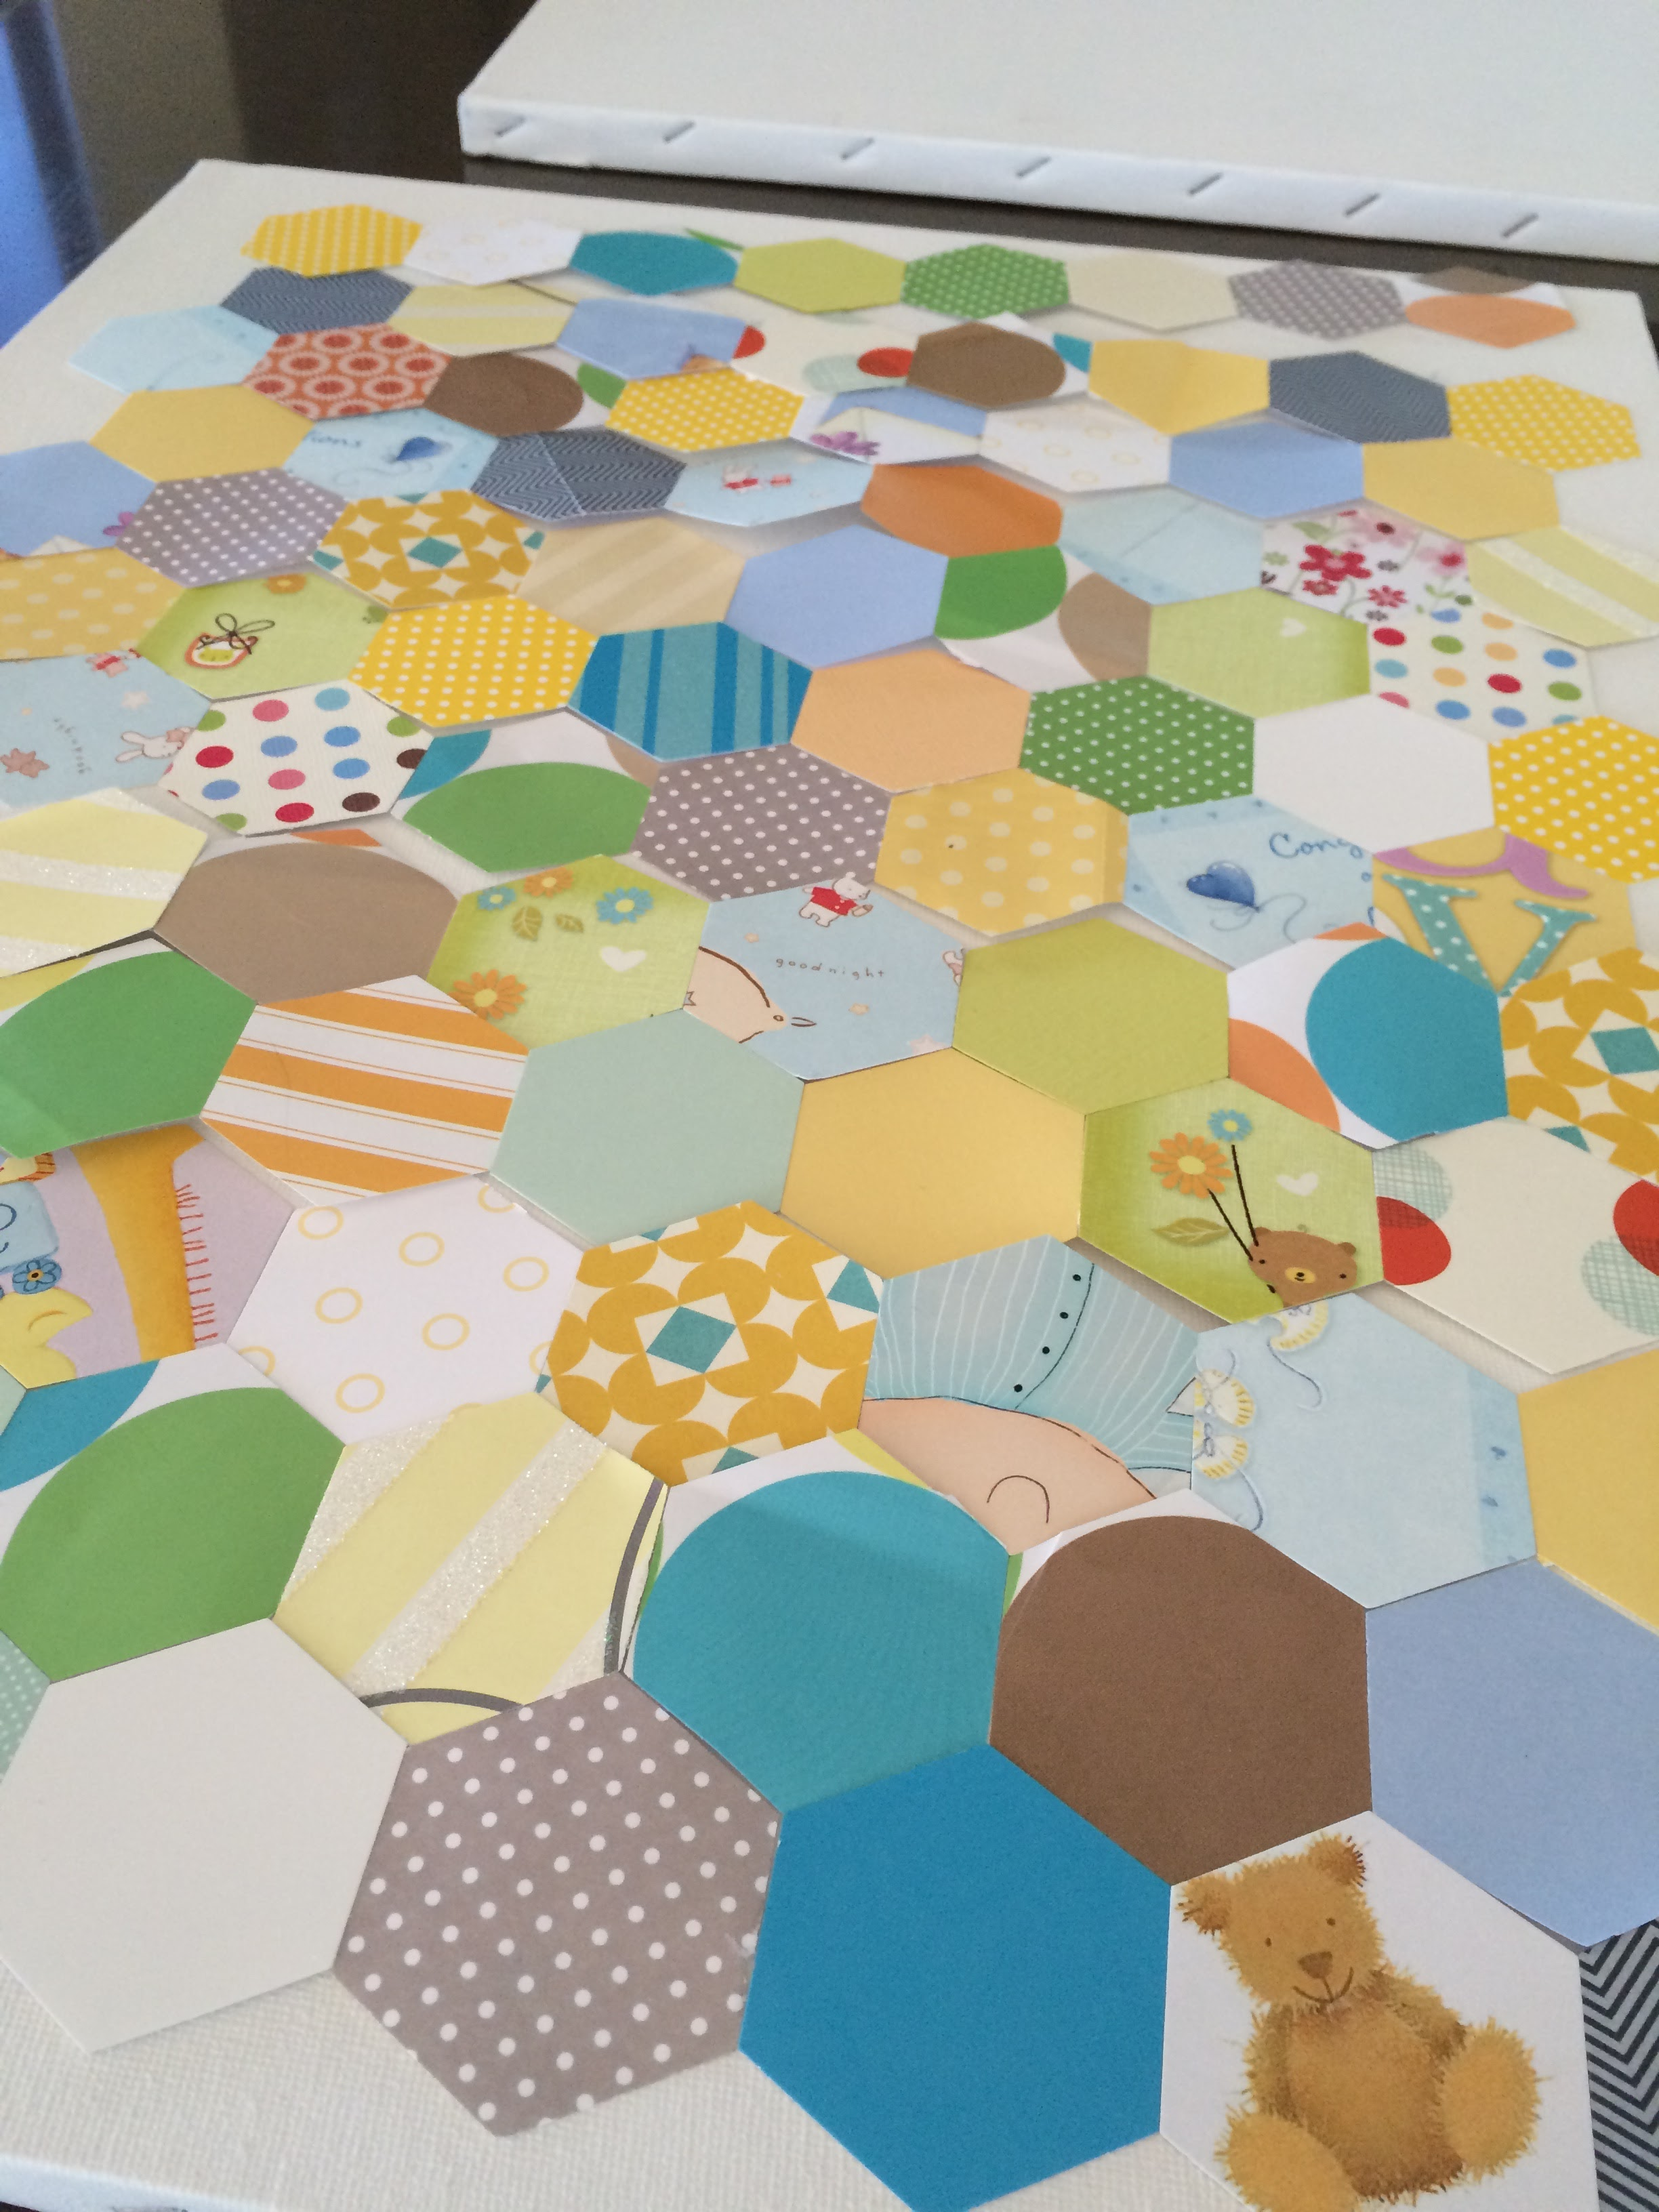 Fresh Nursery Wall Art Ideas Decoupage, Glue, Sew and